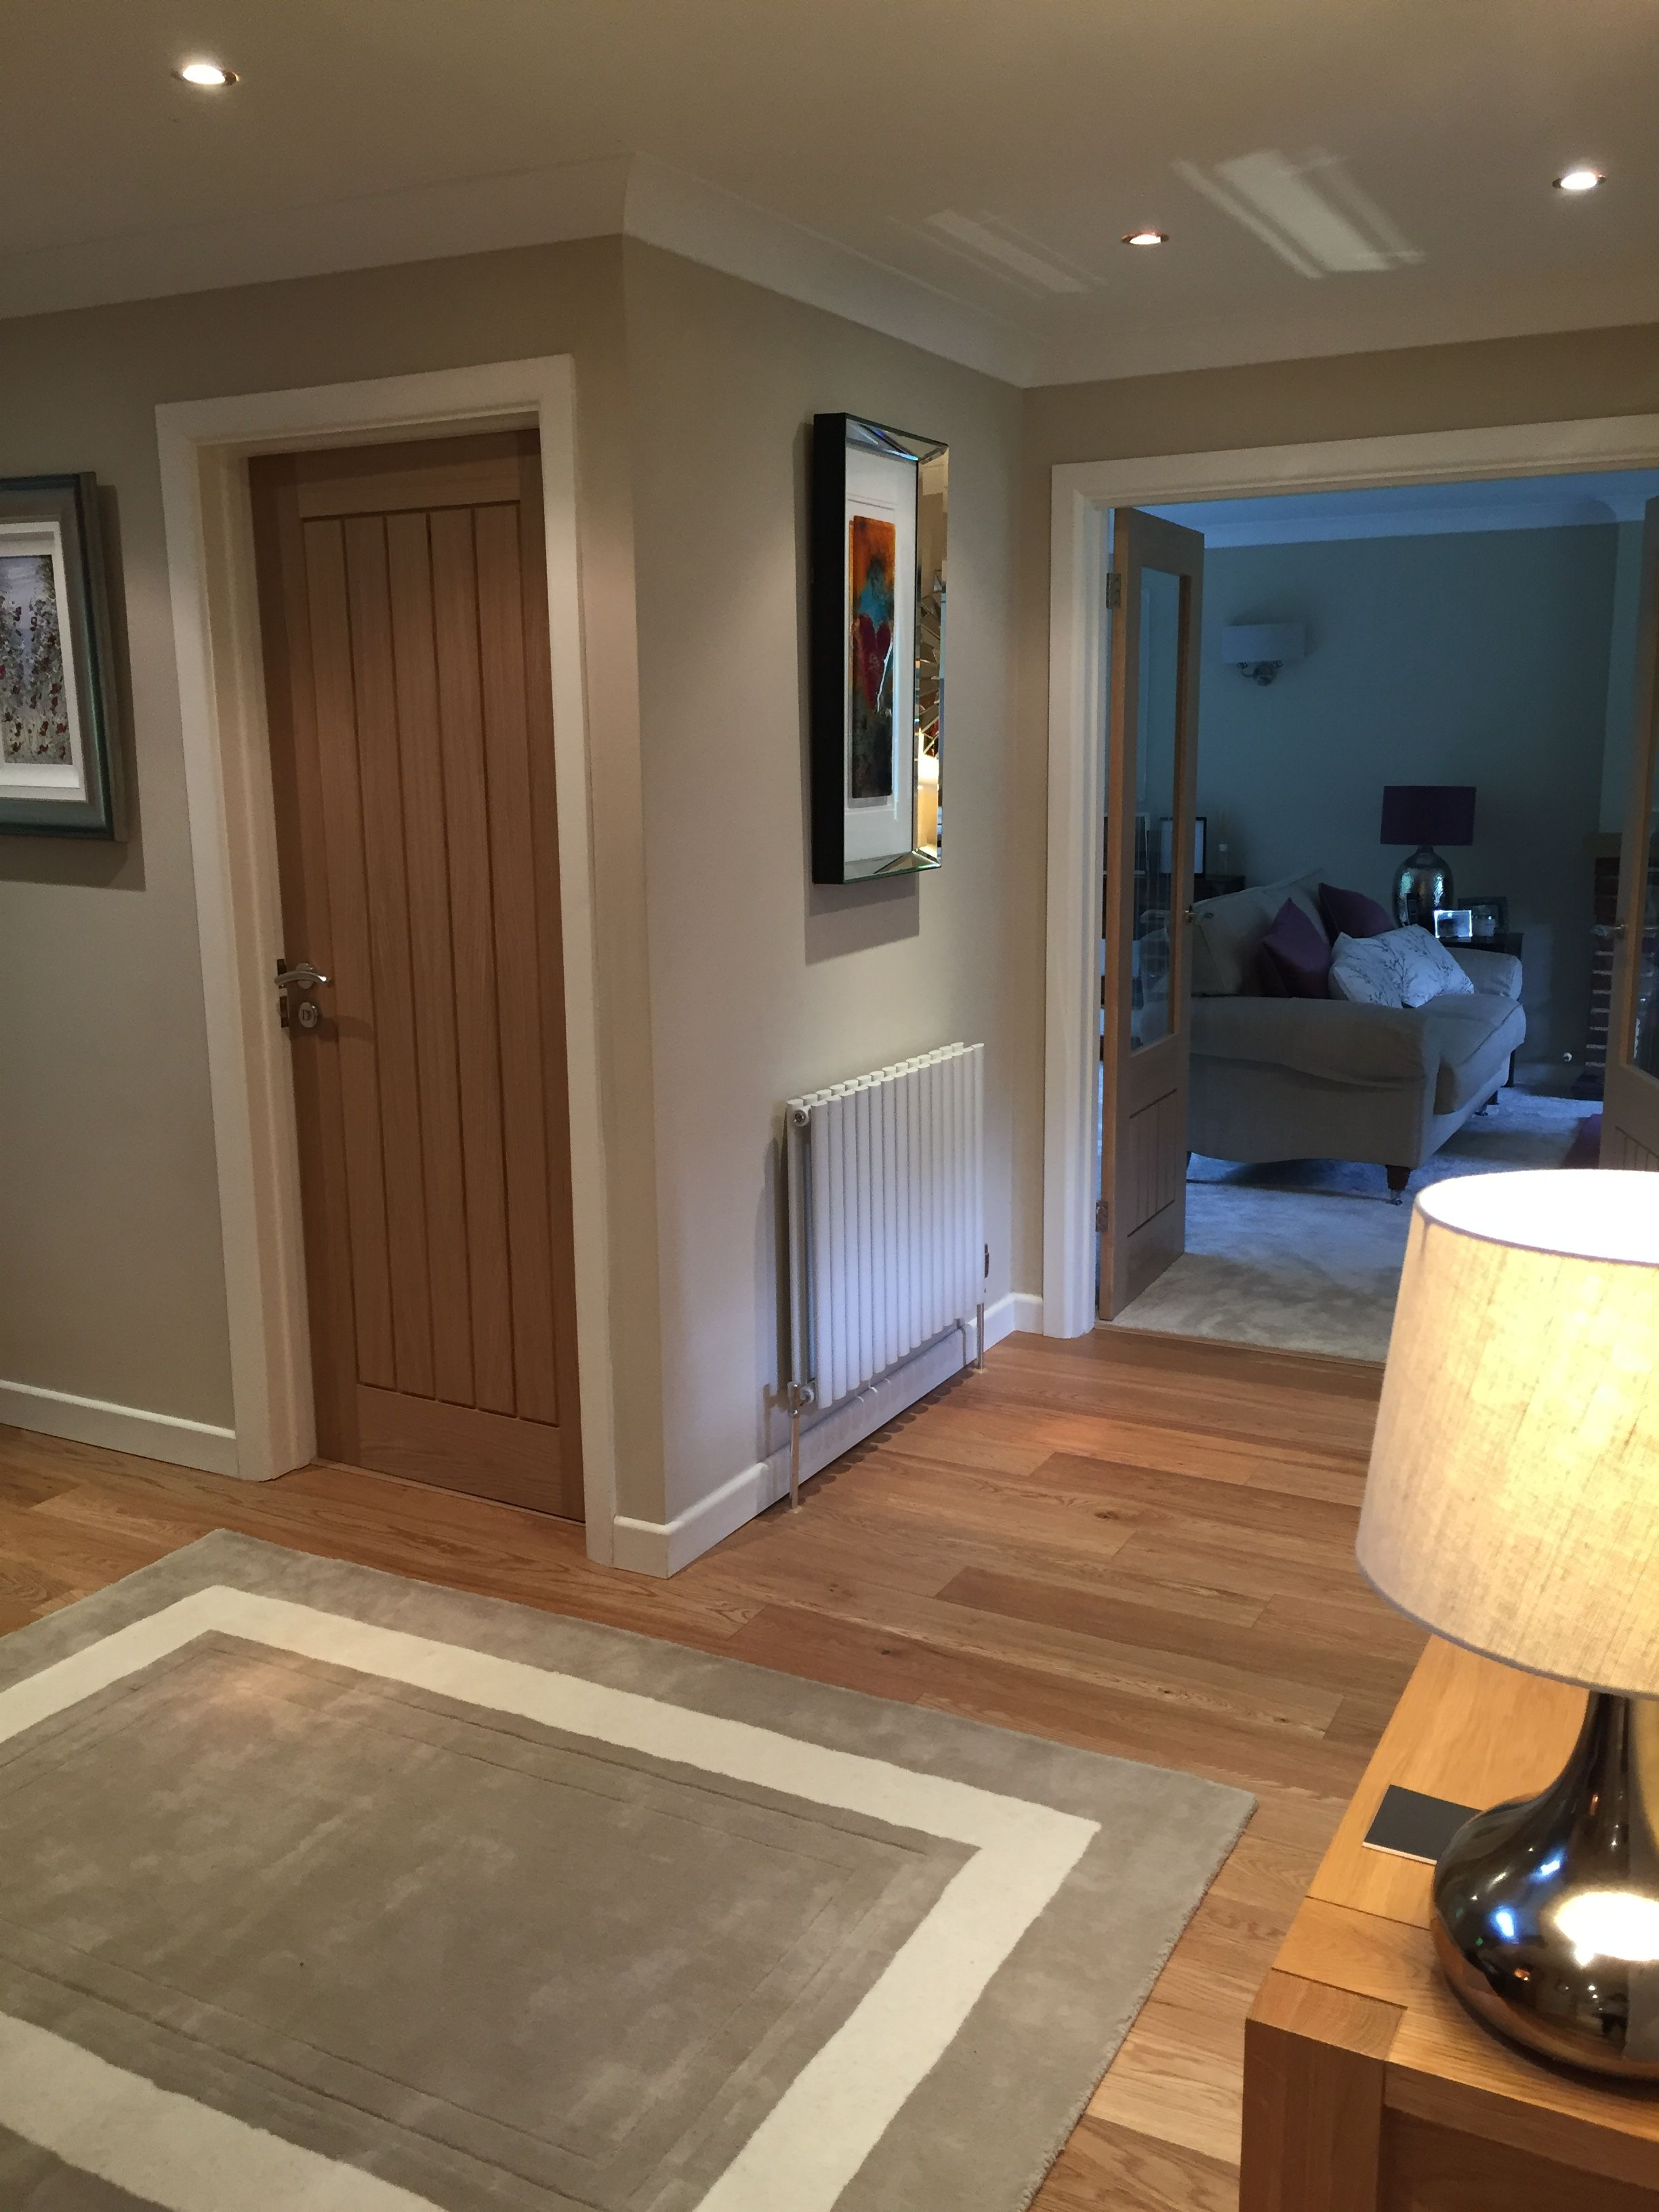 Hall farrow and ball joas white paint accessories laura - Dimity farrow and ball living room ...